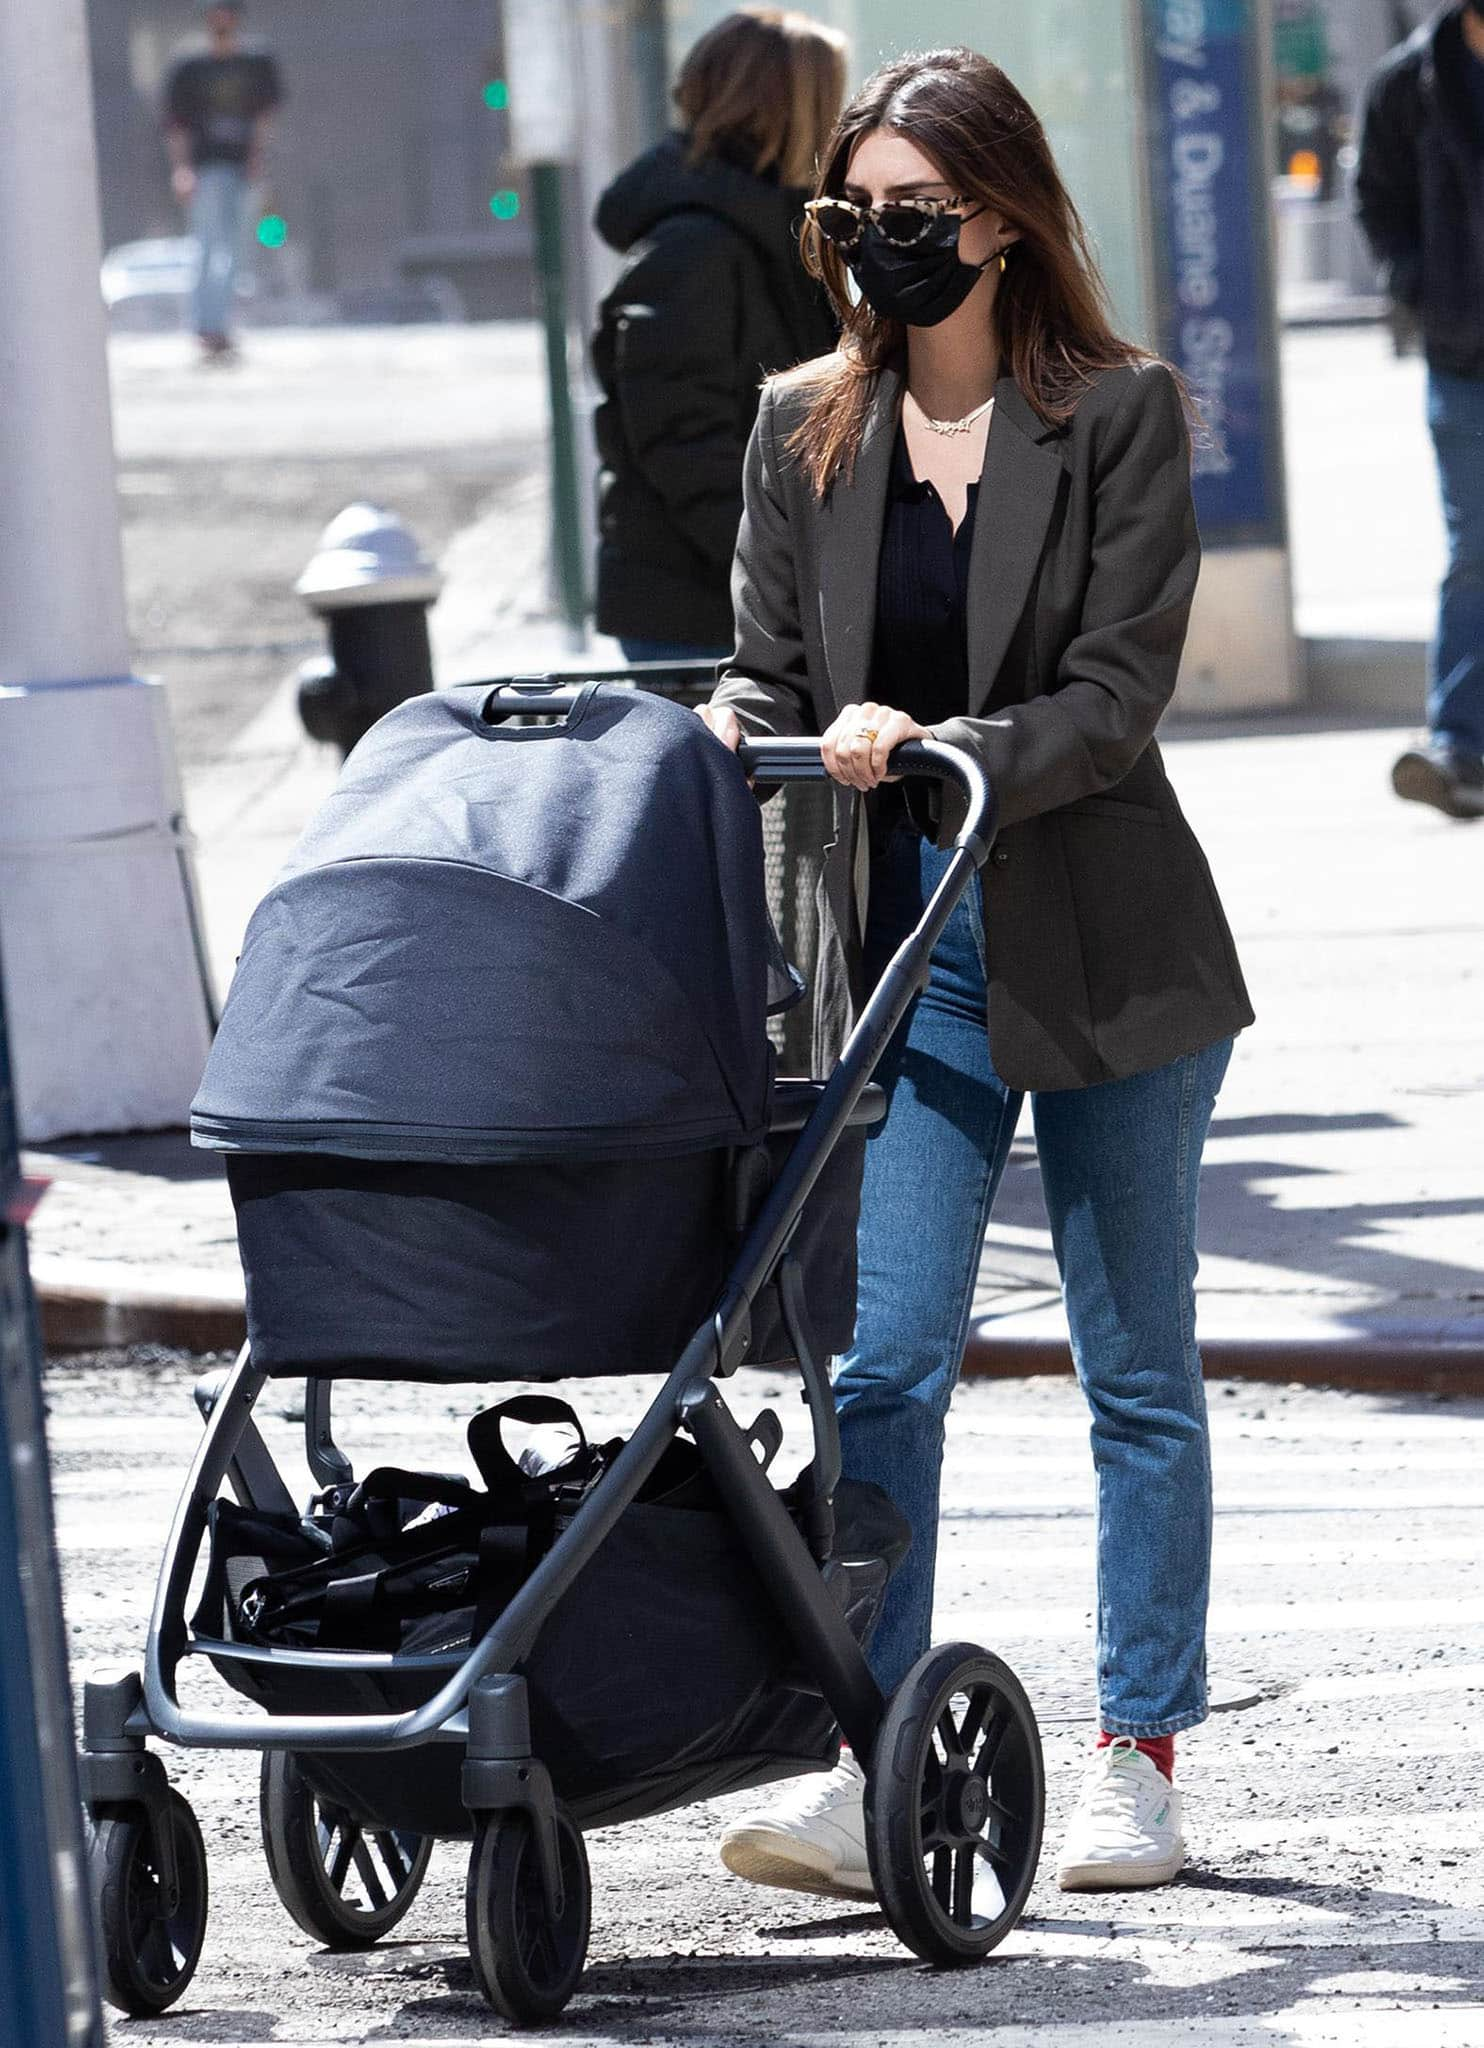 New mom Emily Ratajkowski pushes her newborn son in Uppababy stroller